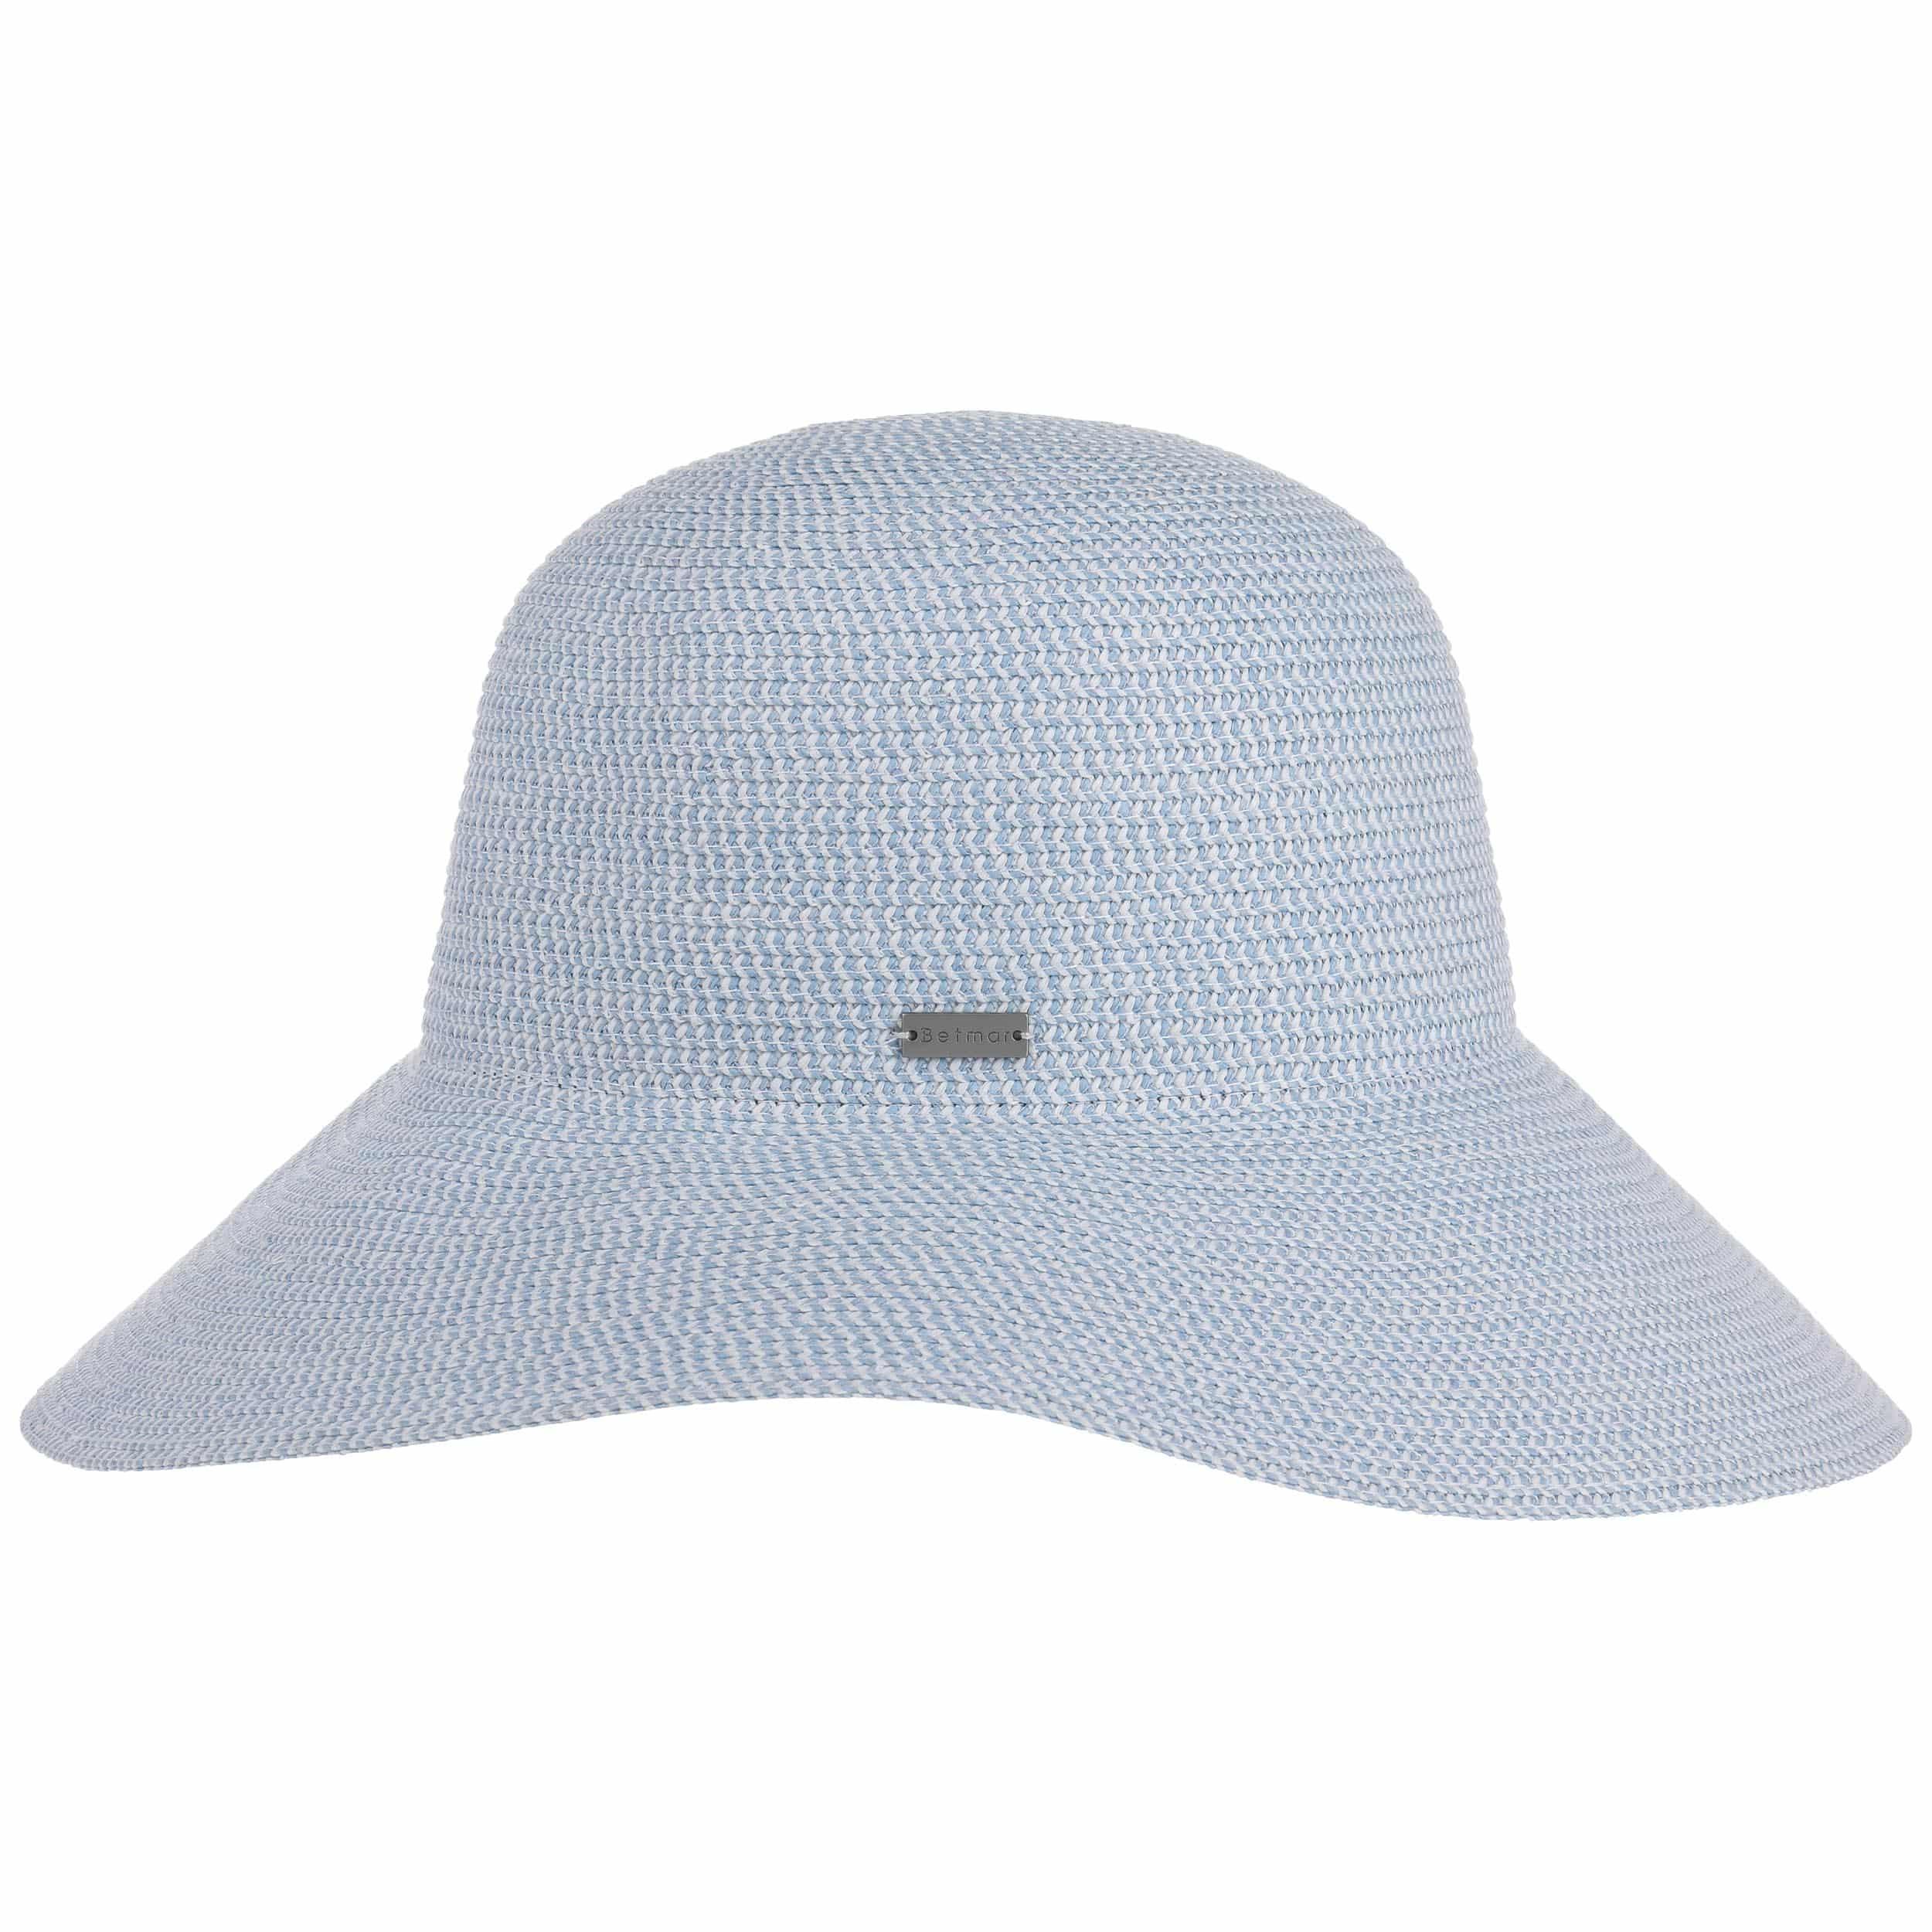 Sombrero ala Ancha Gossamer by Betmar - Sombreros - sombreroshop.es b6643df0654